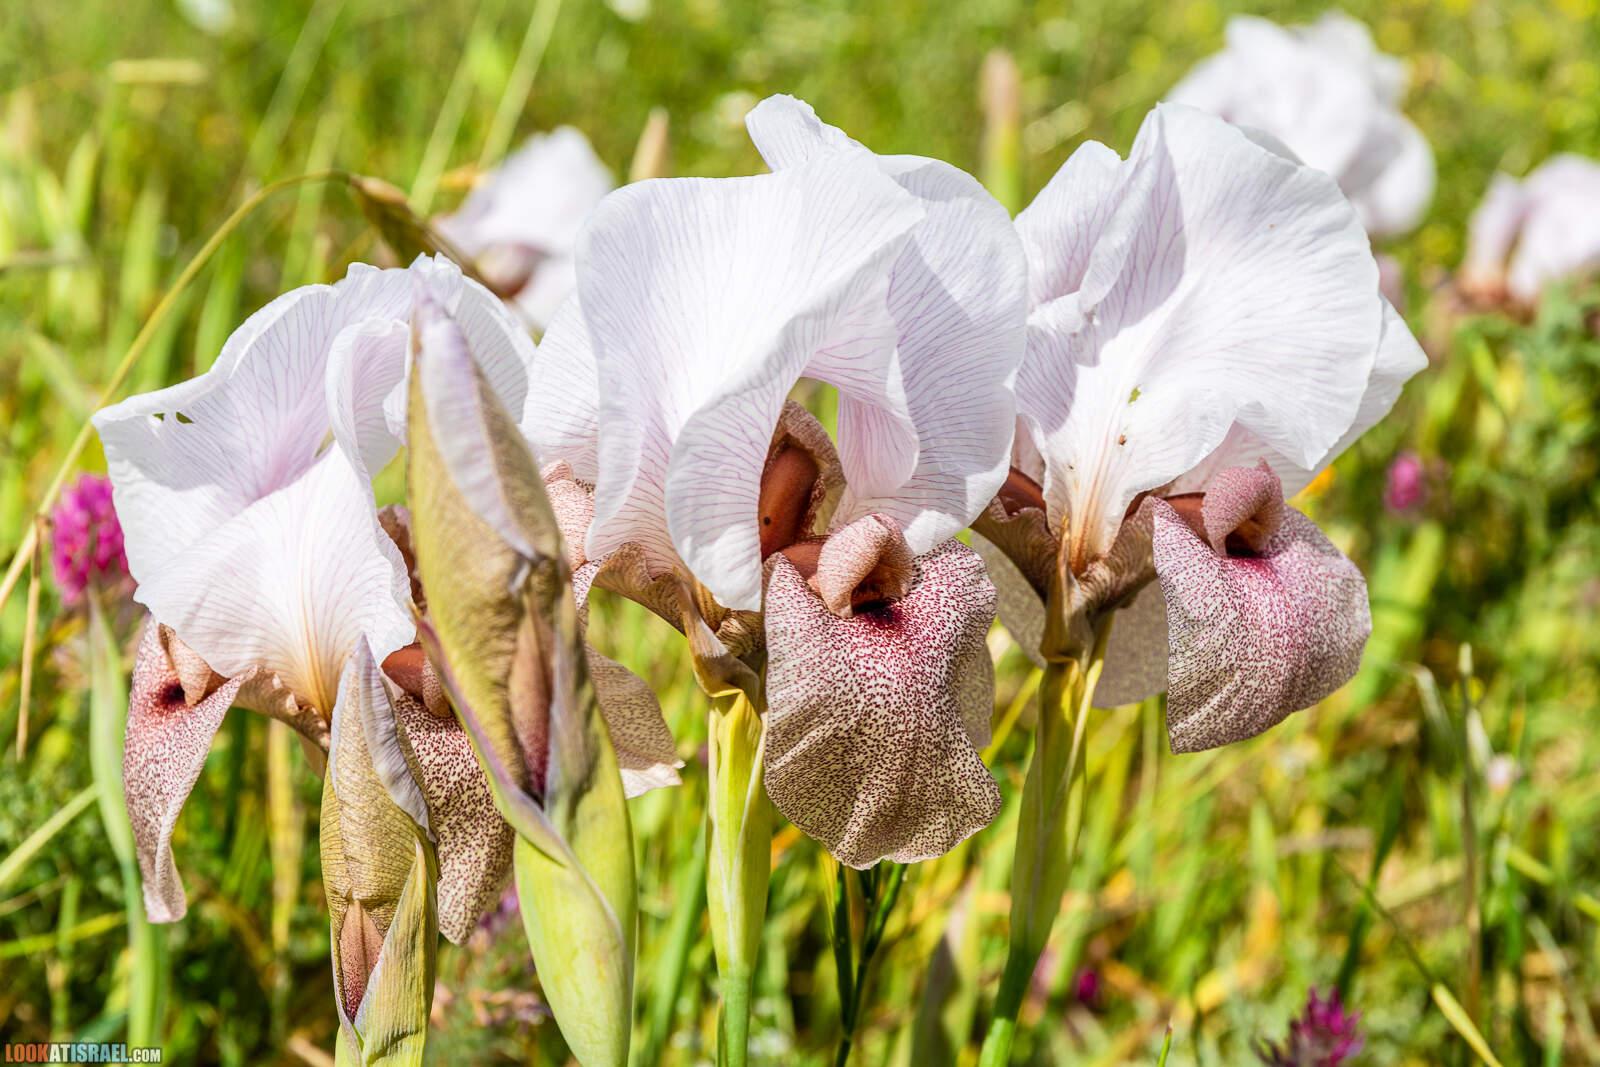 Ирис дорский (Ирис Лорте) - Iris lortetii - אירוס הדוּר - LookAtIsrael.com - Фото путешествия по Израилю